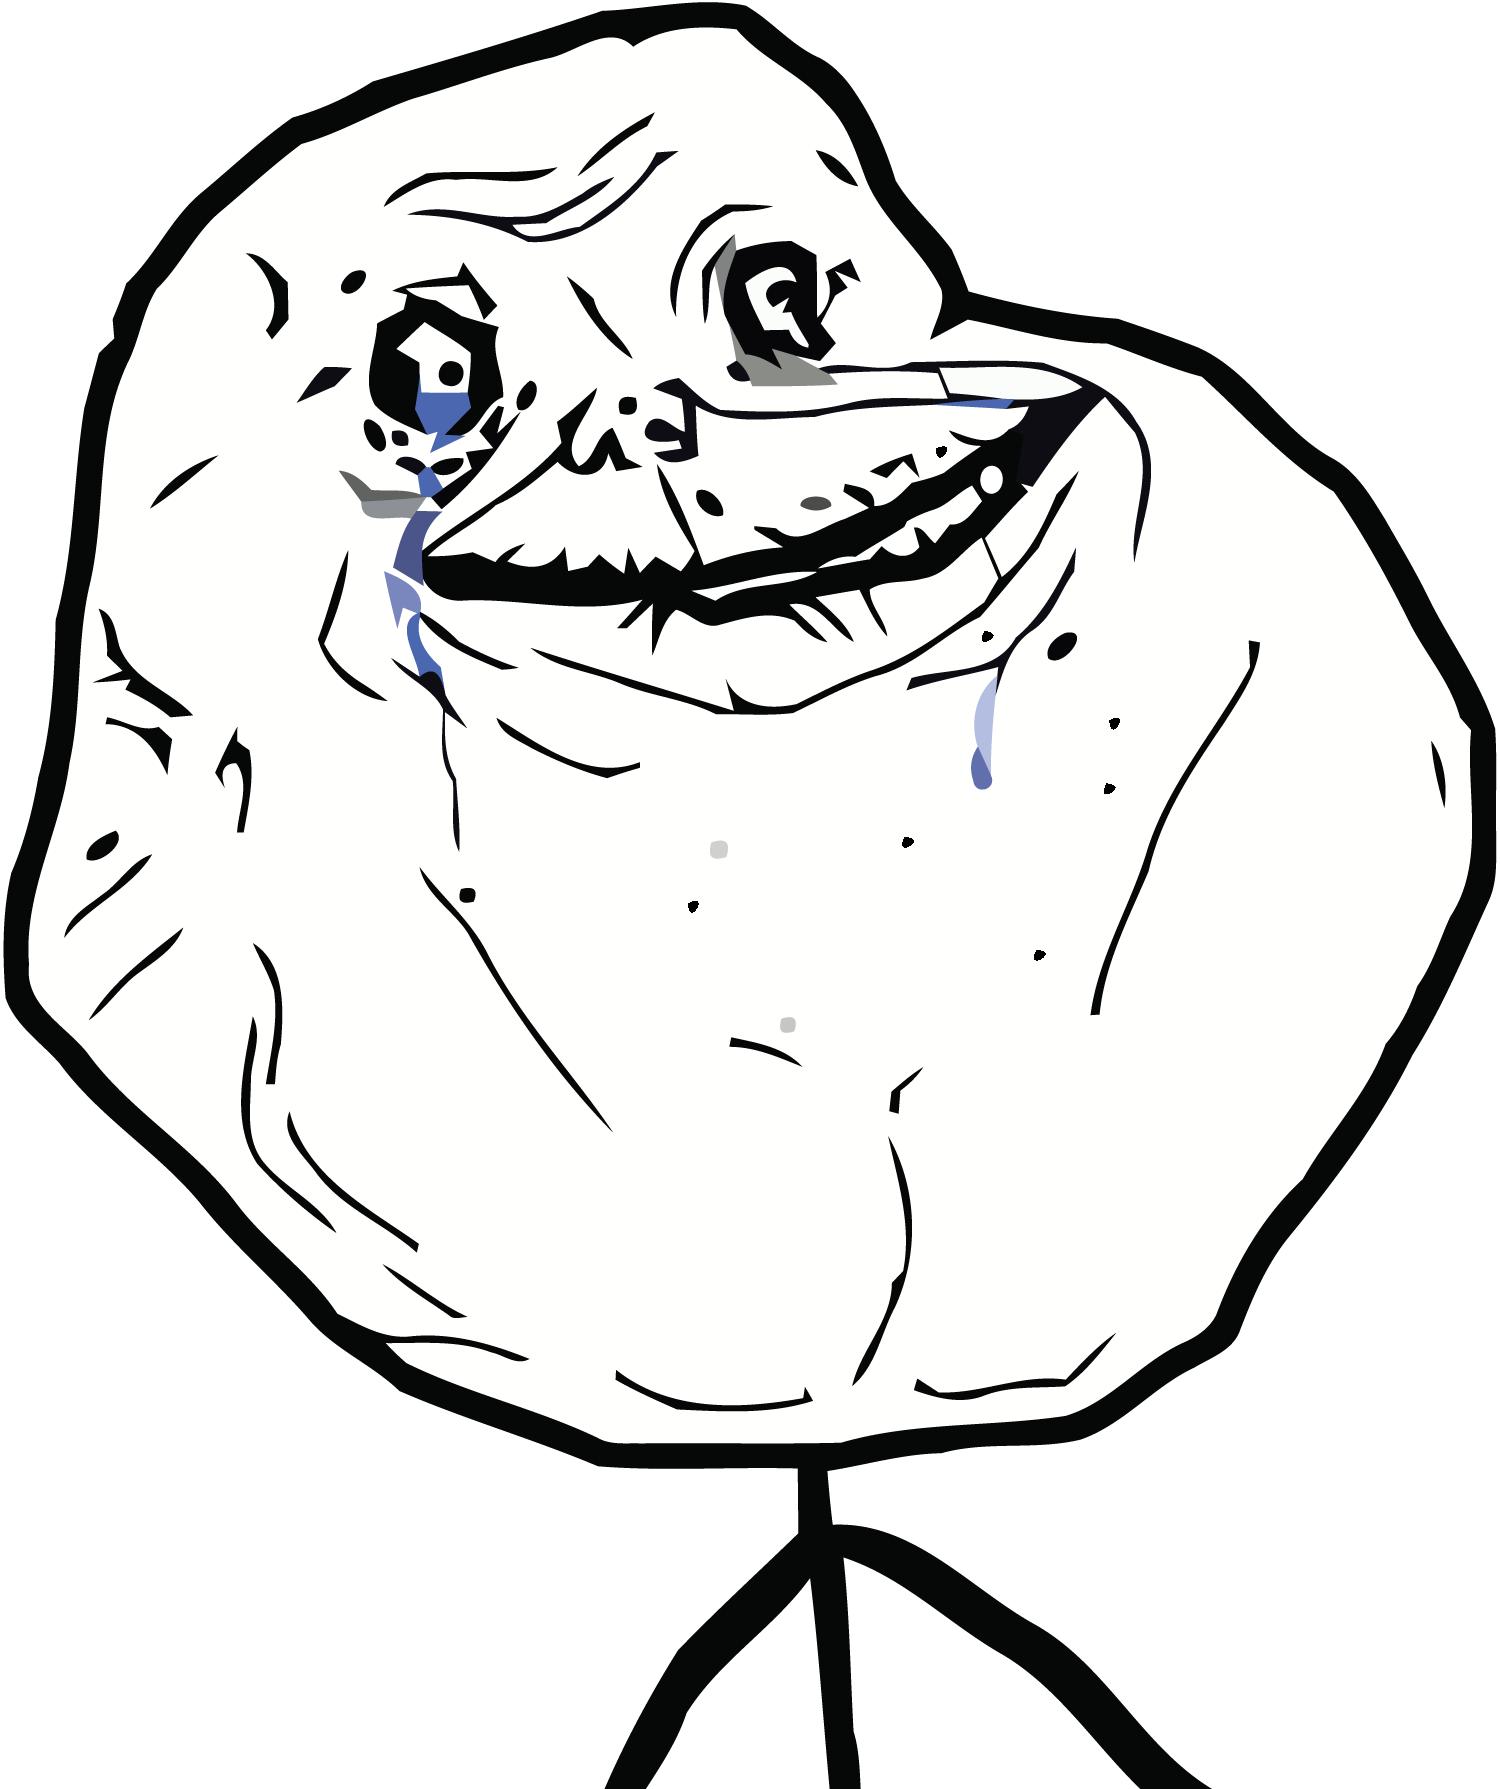 Sad forever alone